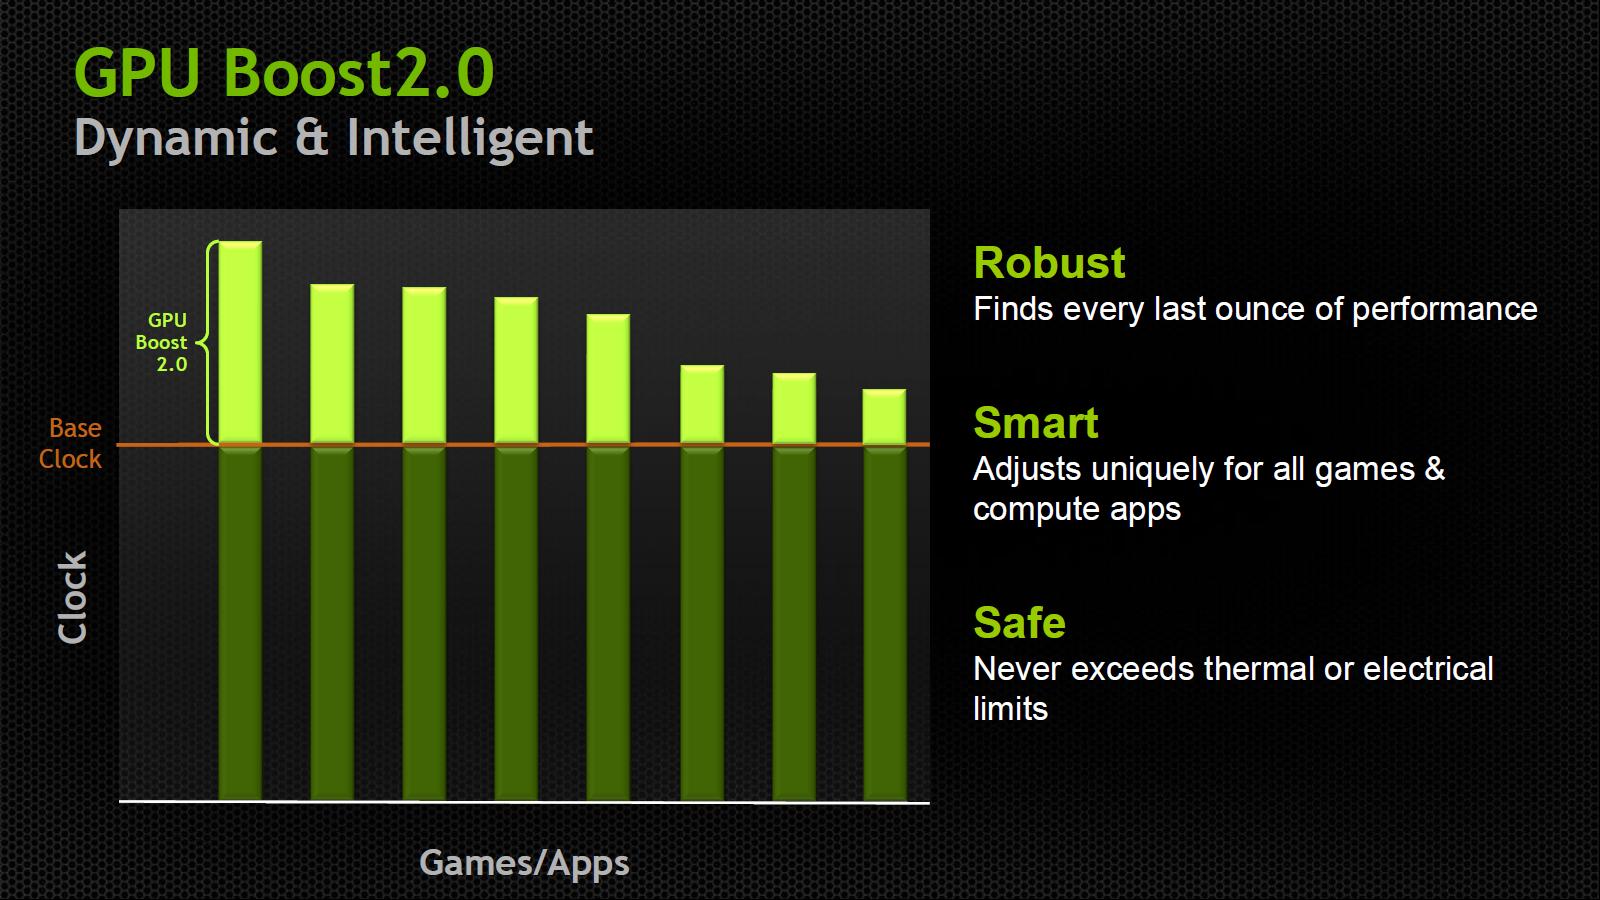 NVIDIA GeForce GT 720M. NVIDIA GeForce GT 720M graphics card